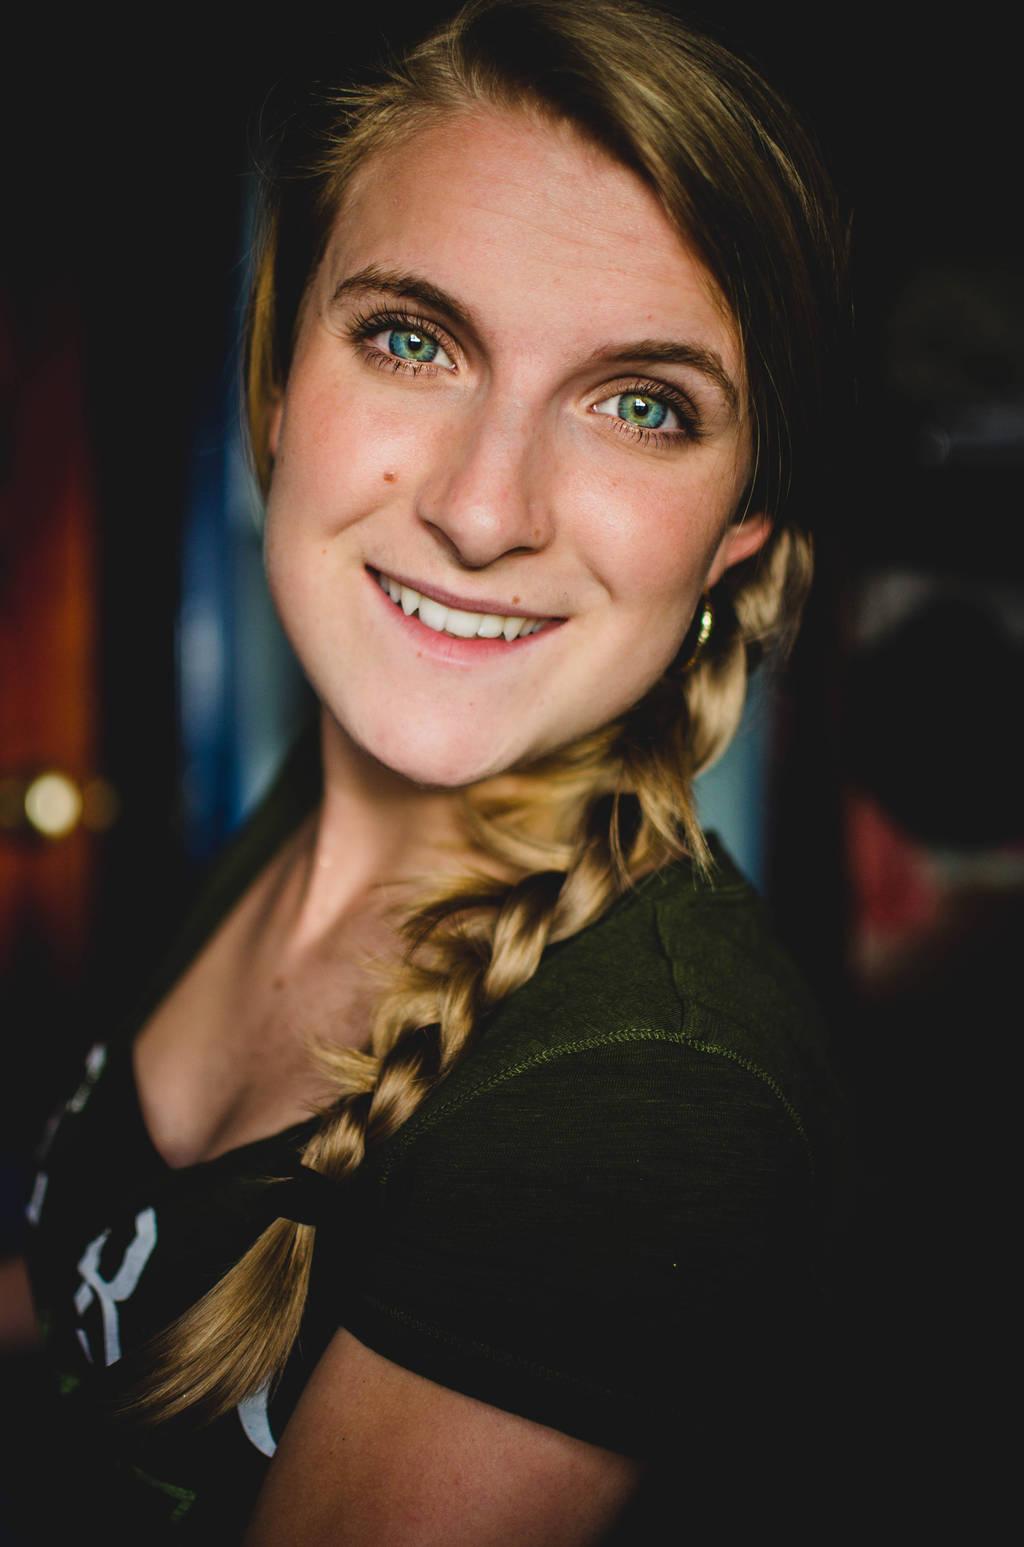 smilejustbcuz's Profile Picture